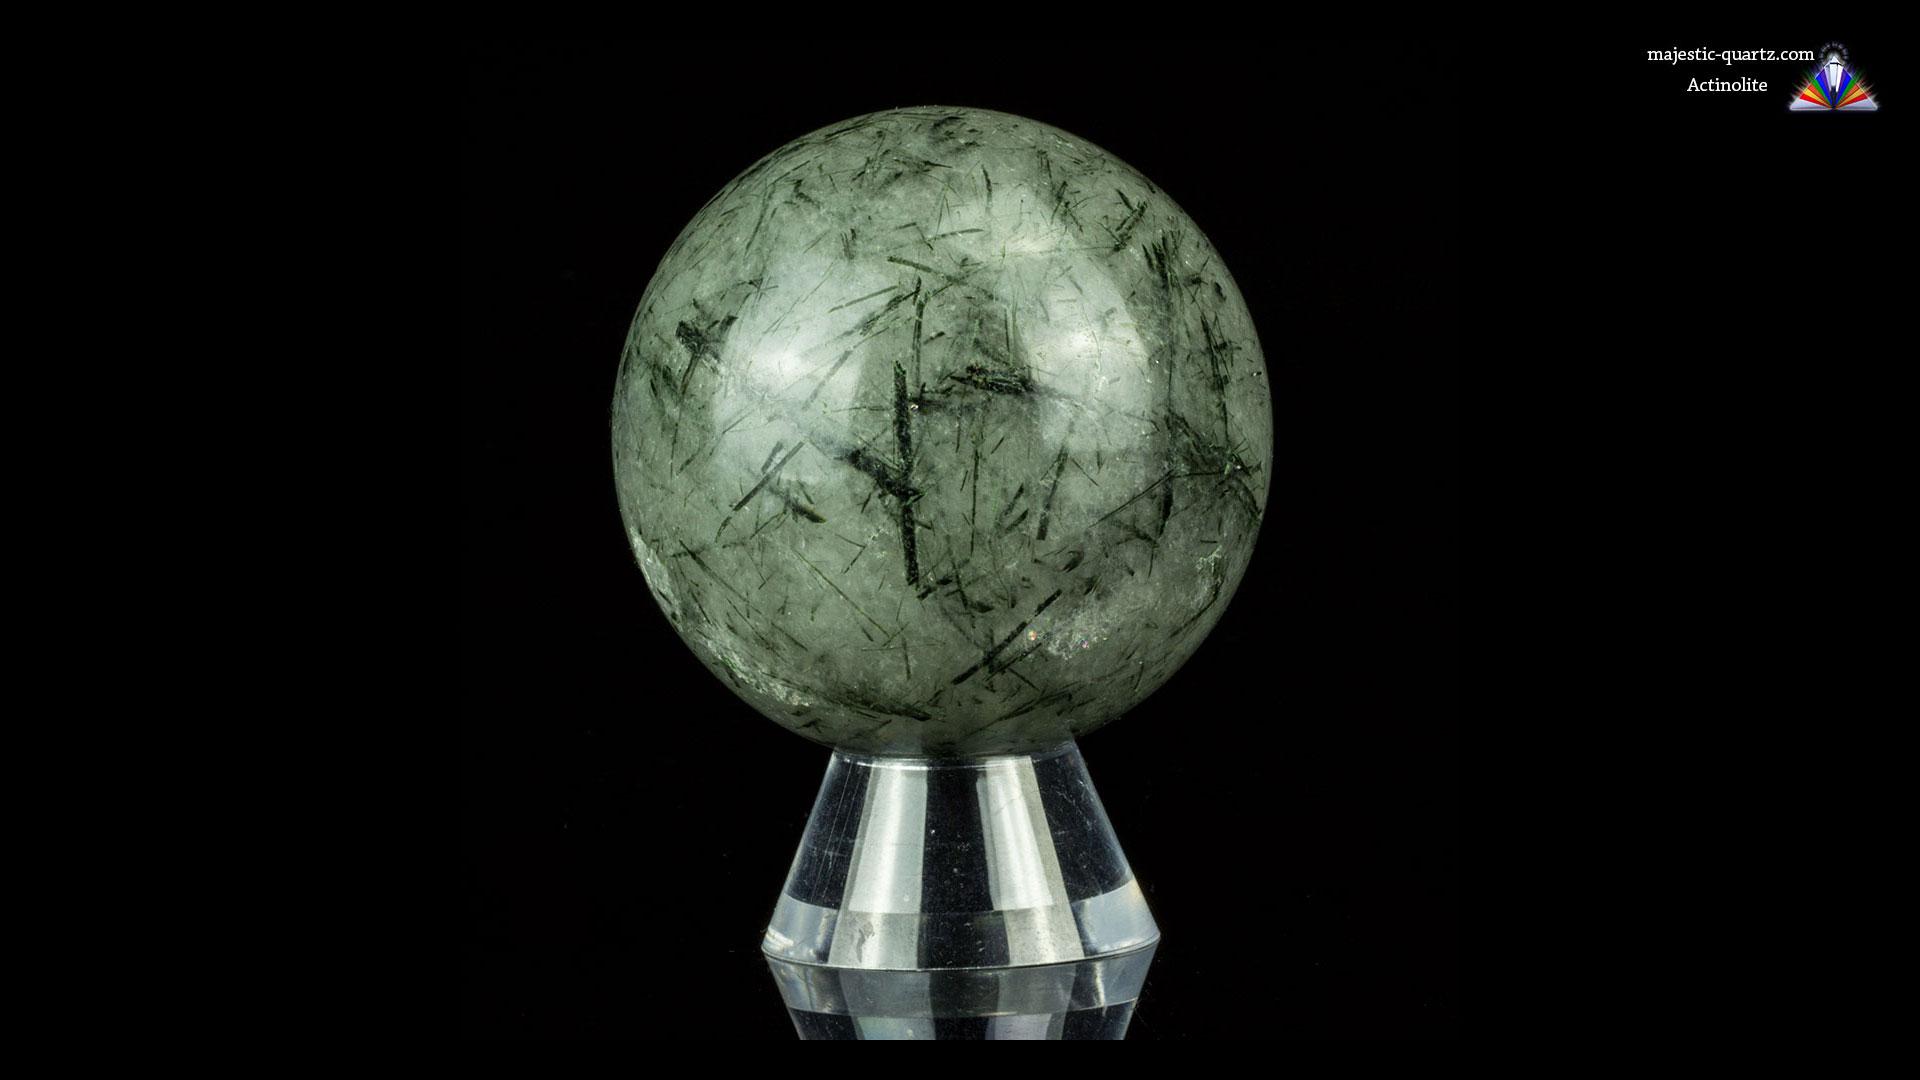 Actinolite Crystal Specimen - Mineral Specimen